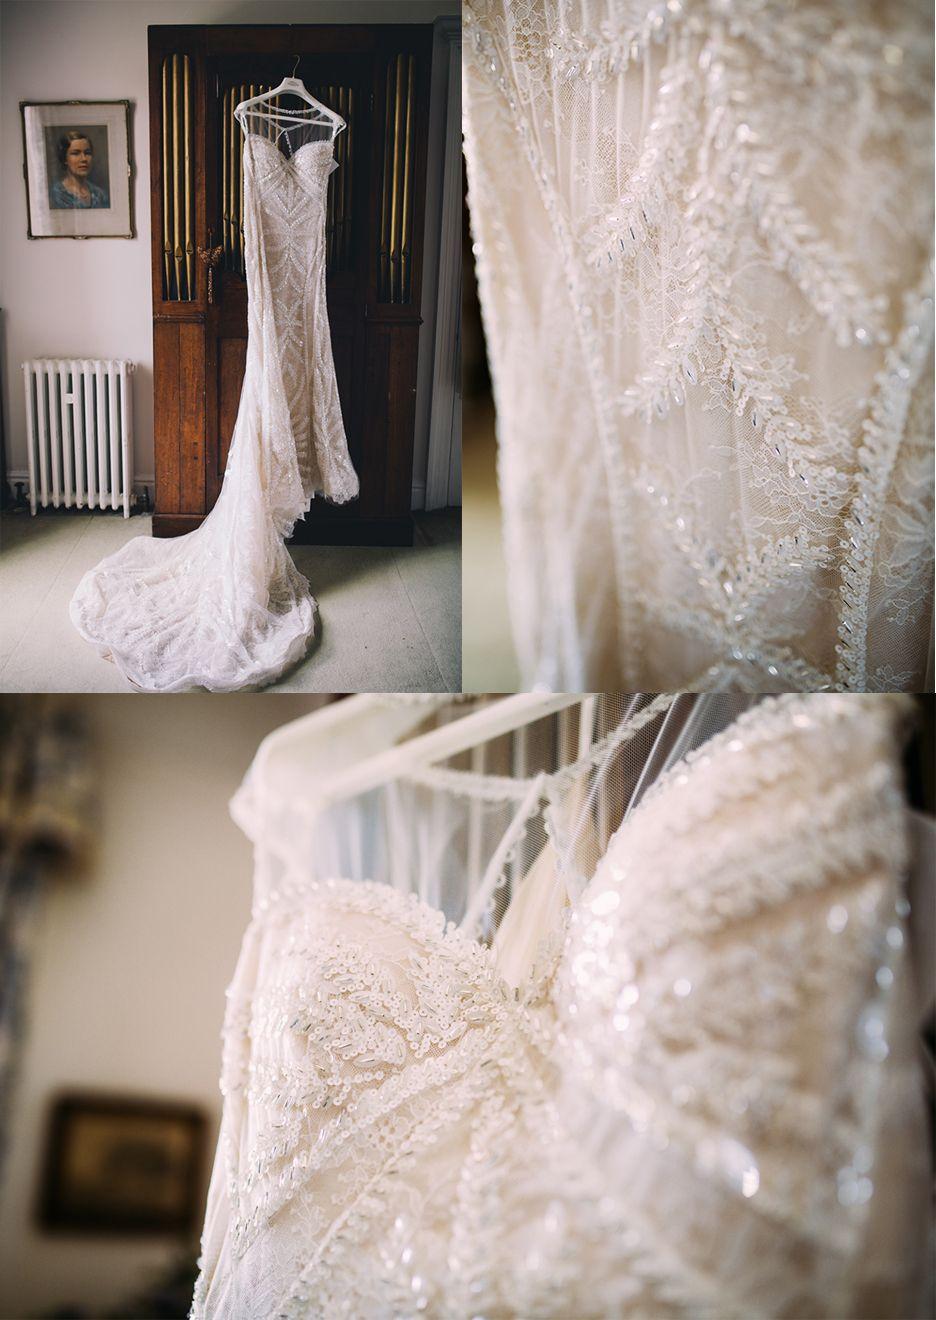 Nush and Phils wedding.   Wedding Dress  #weddingdress #stunning #dress #champagne #jenmarinophotography